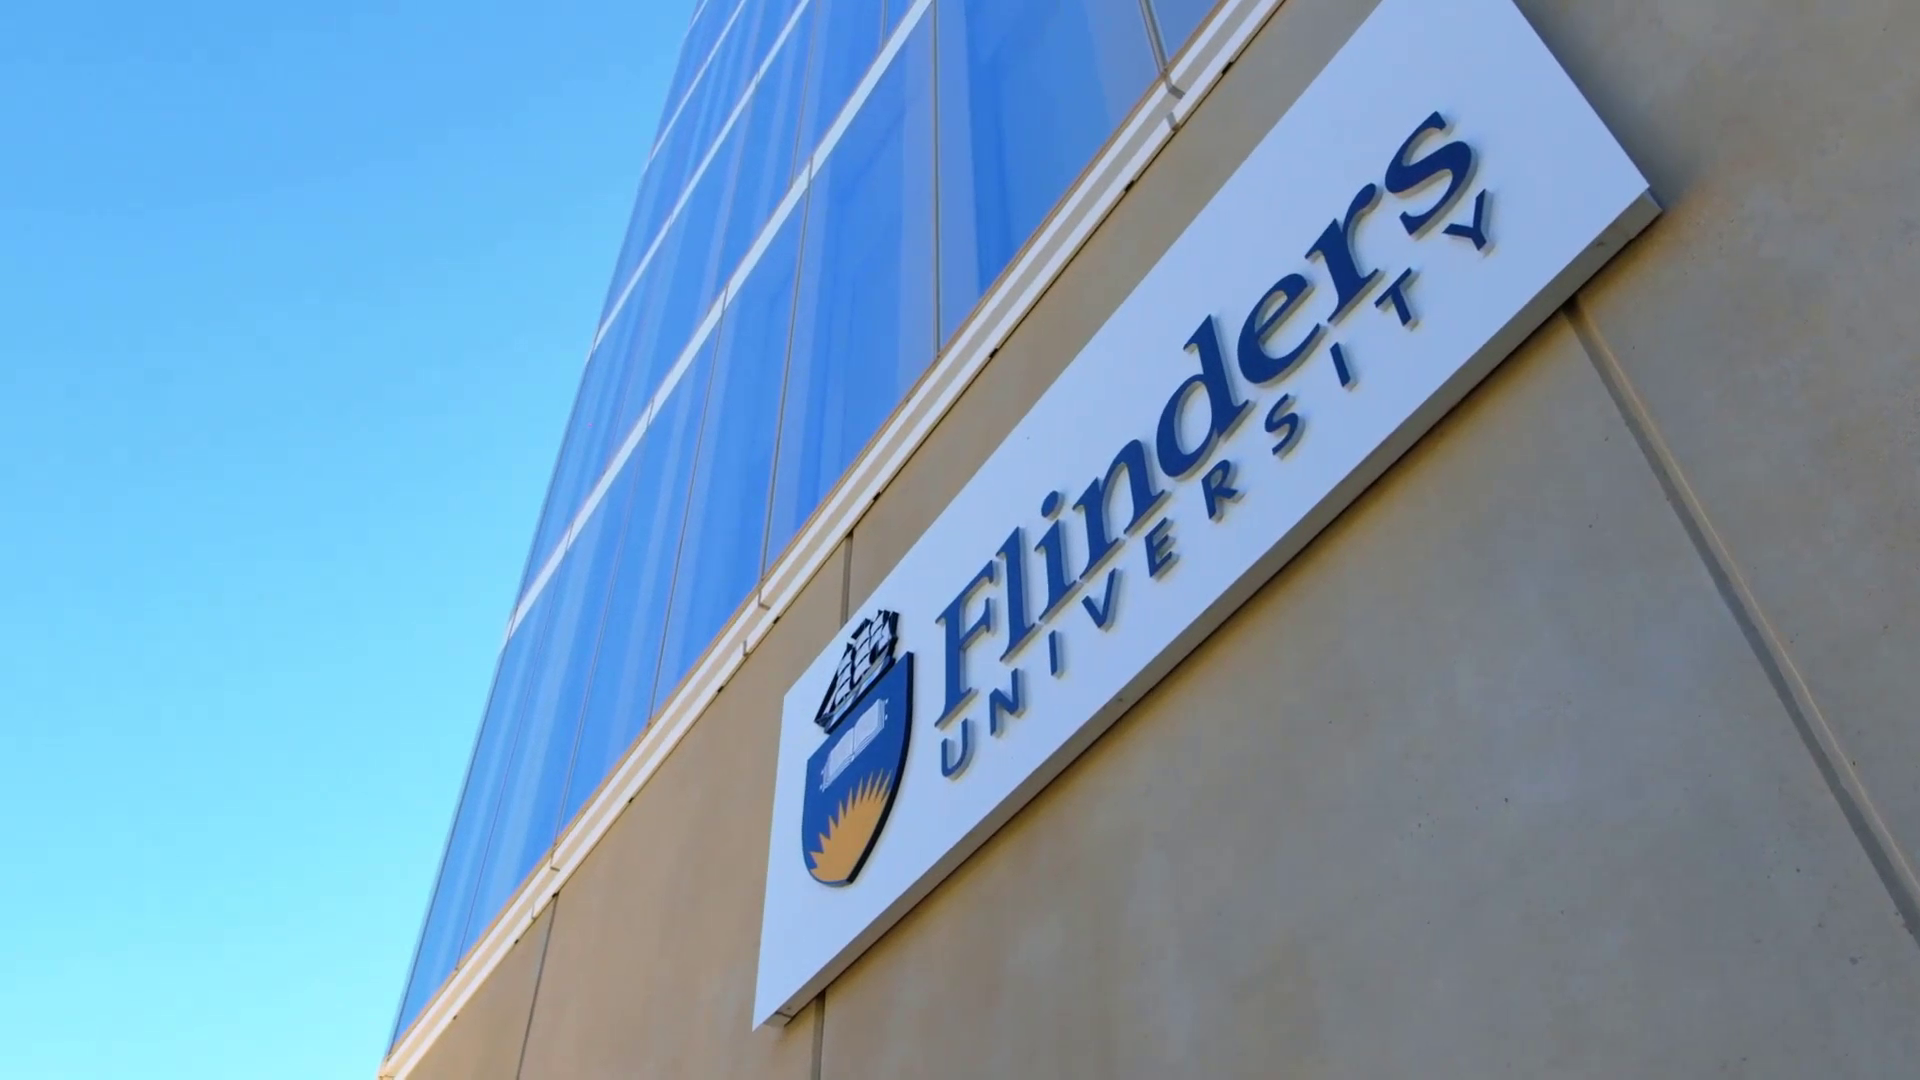 Flinders University sign on Flinders at Tonsley building